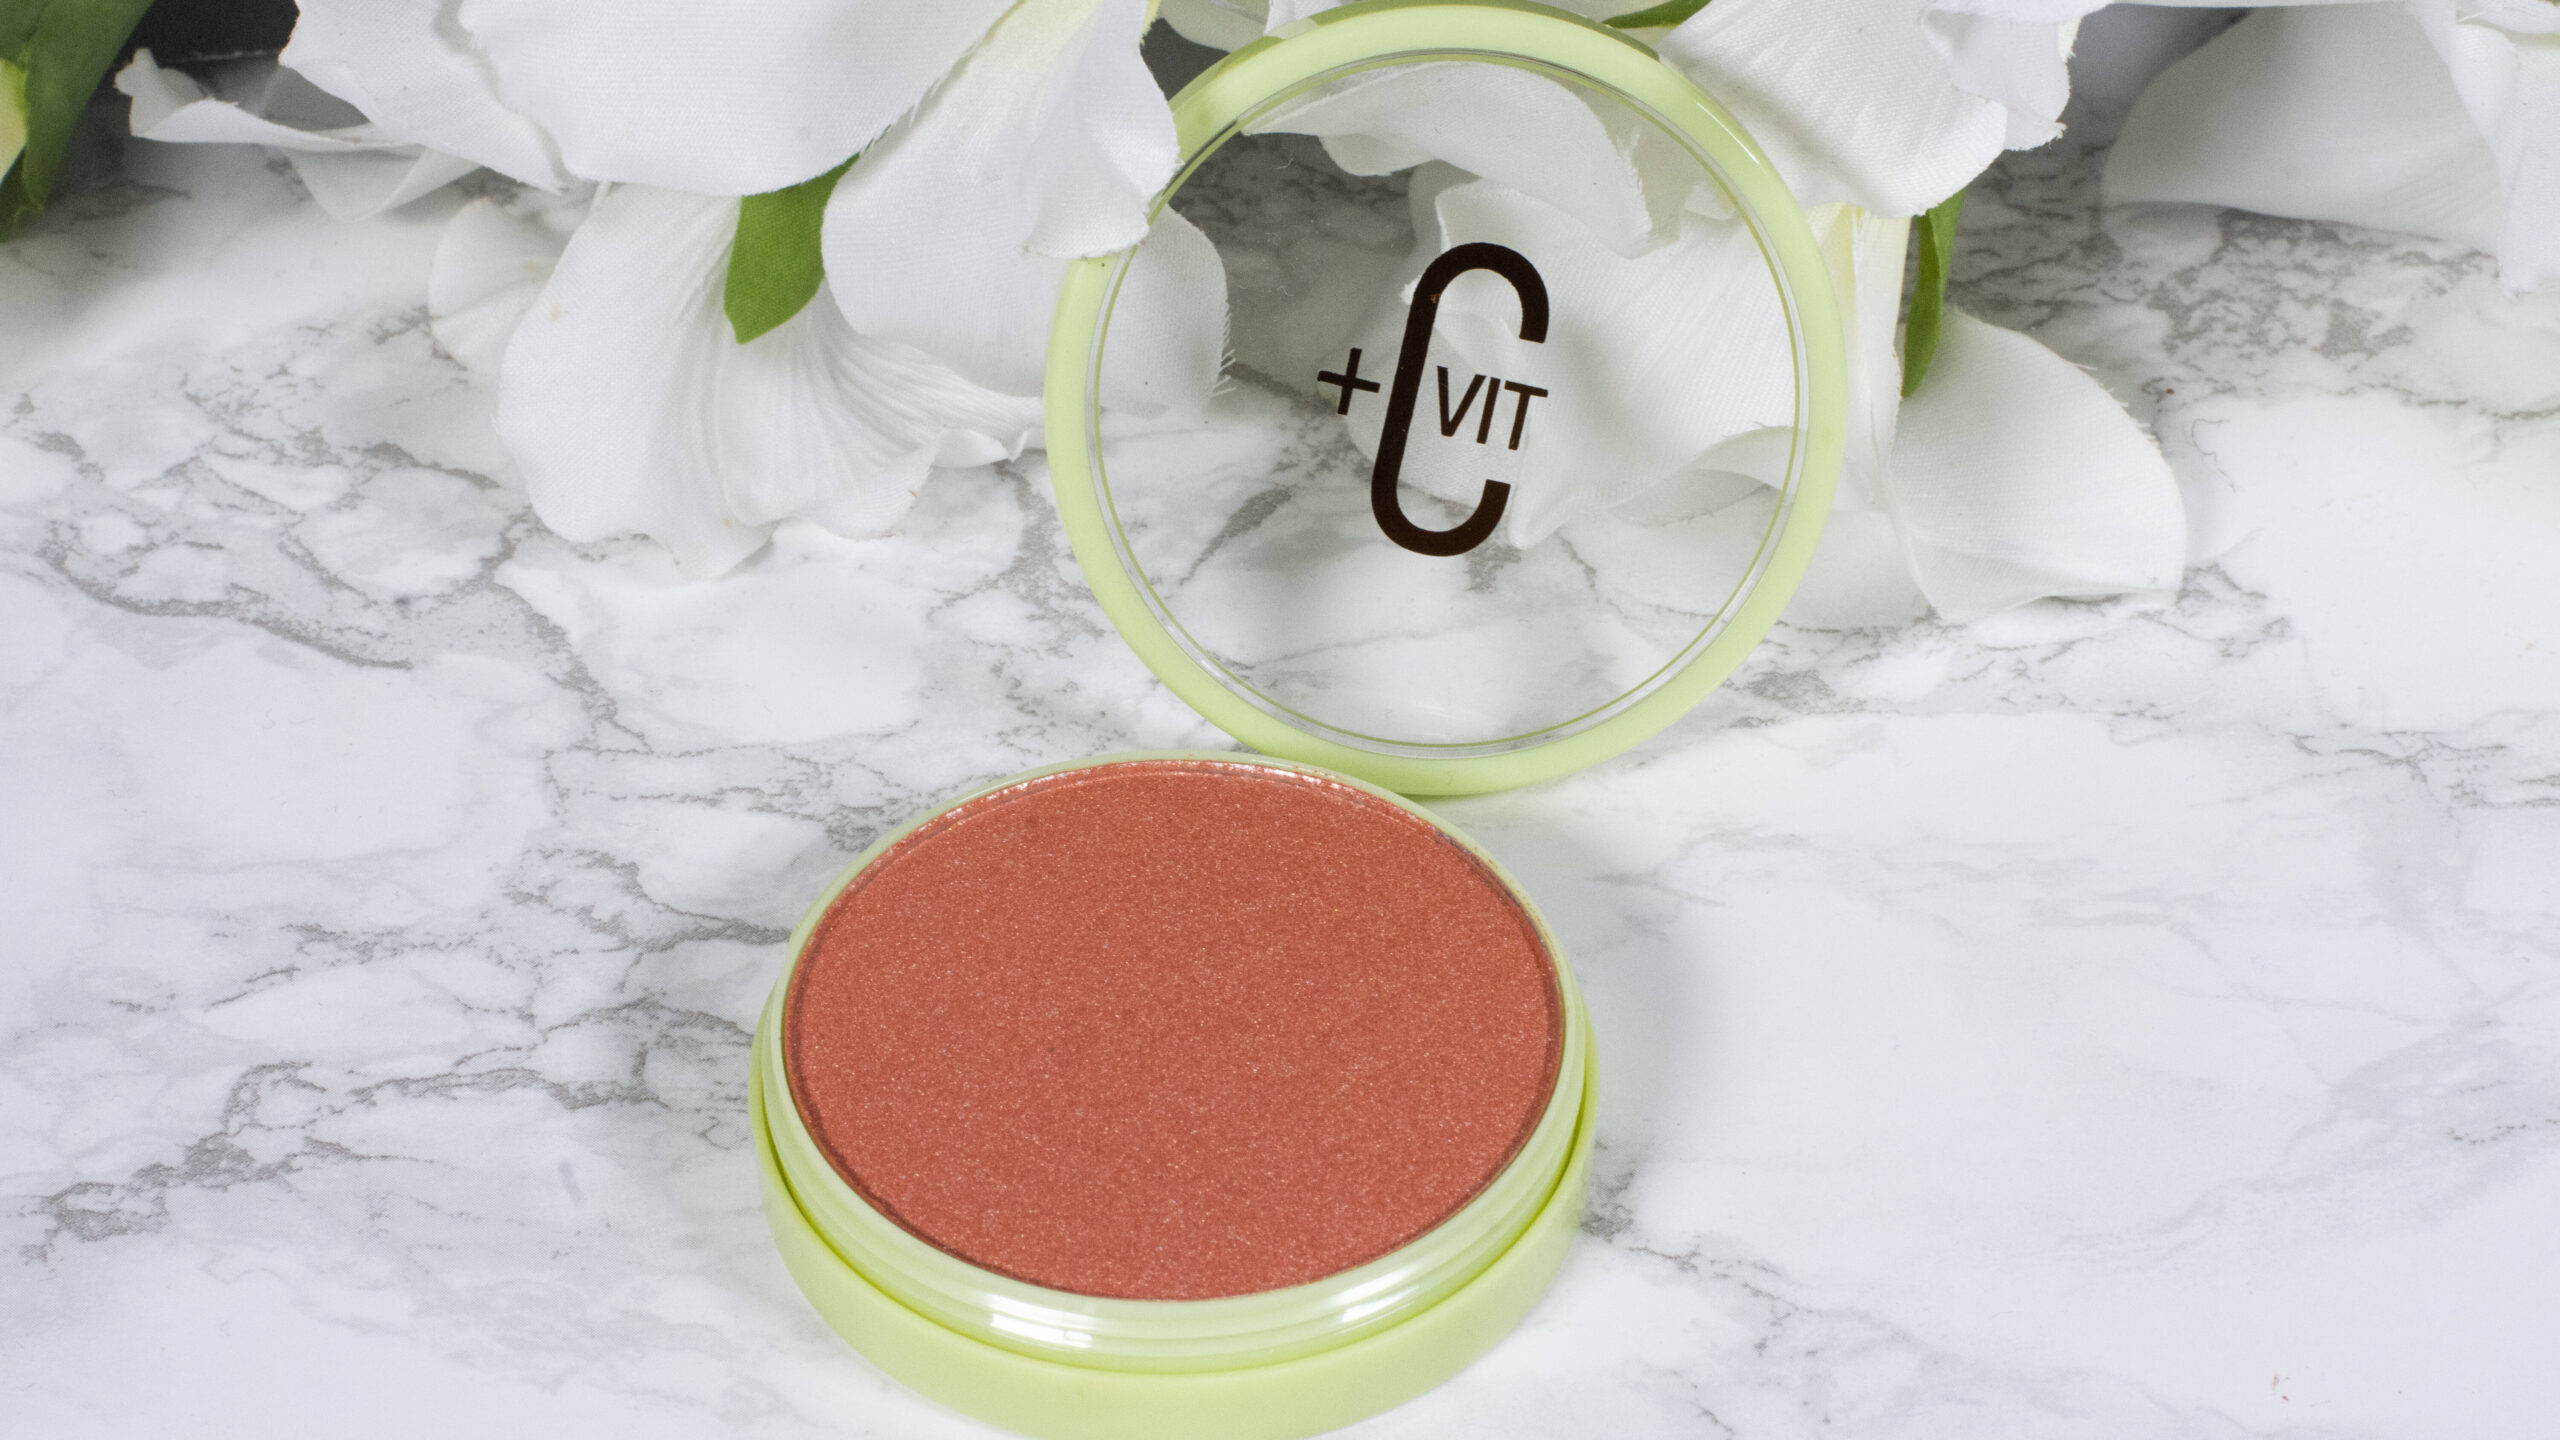 pixi +C VIT Glow-y Powder Peach Dew